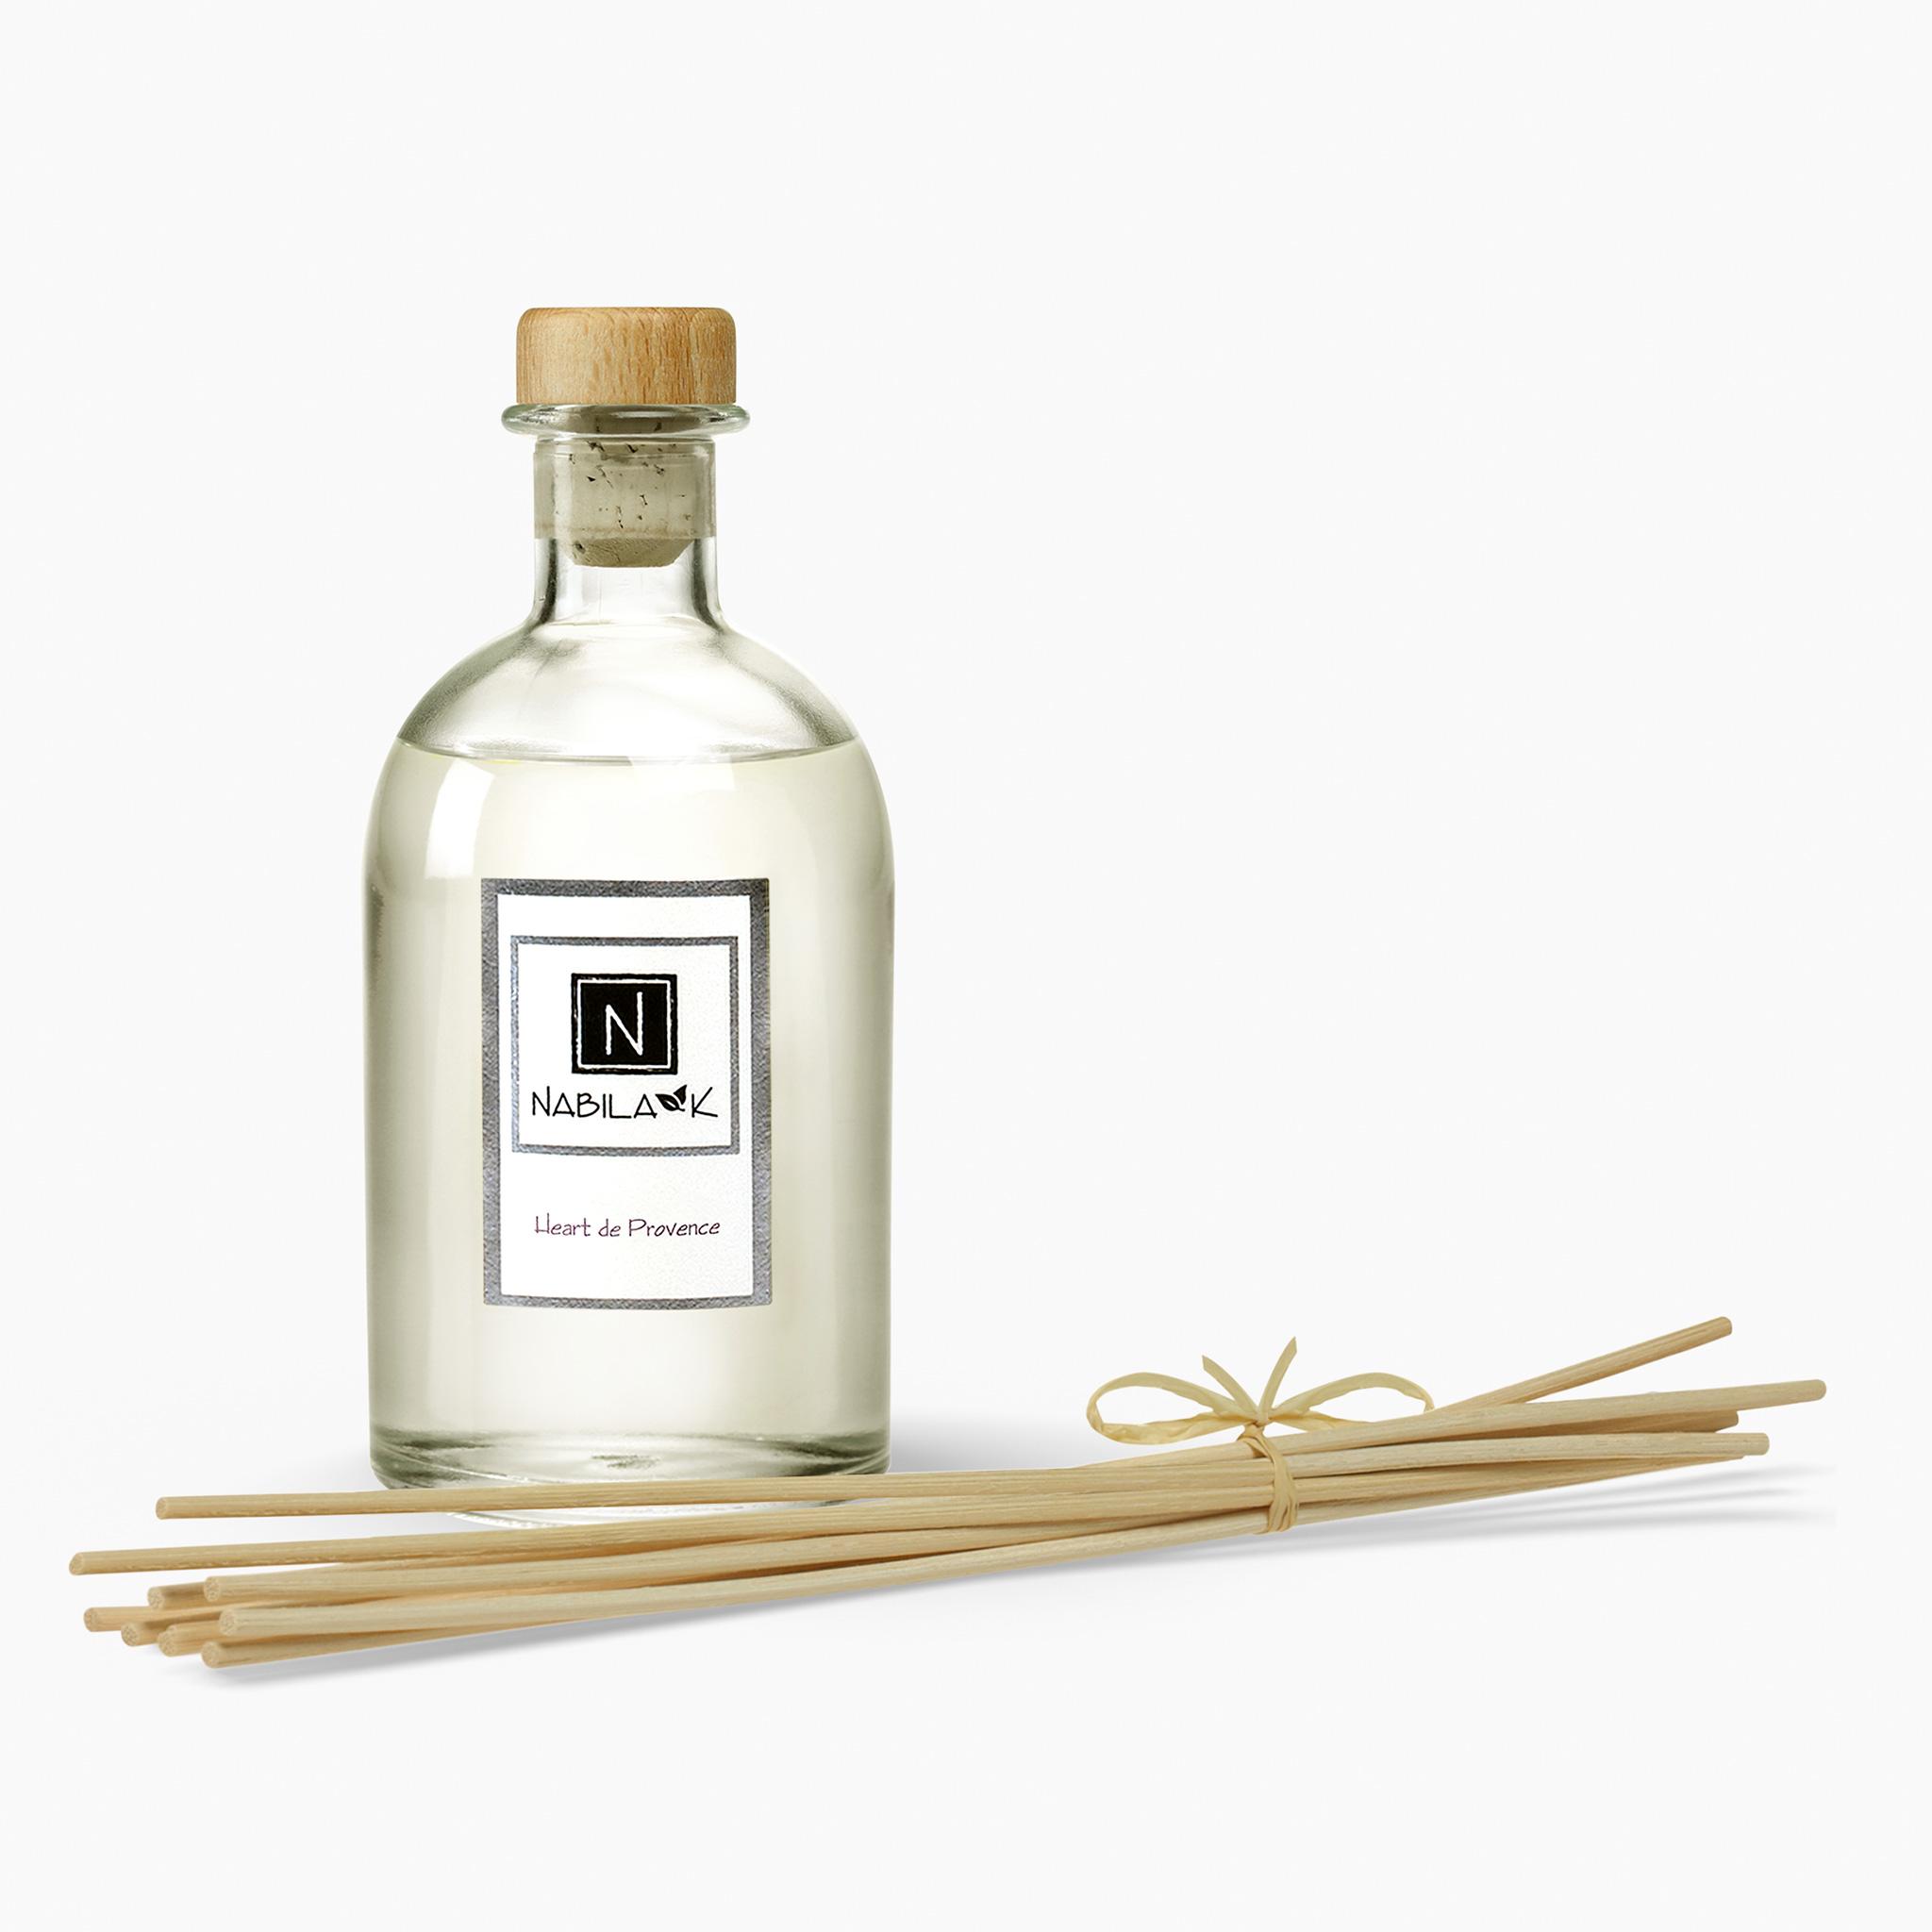 1 Bottle of Nabila K's Heart de Provence Diffuser with Reeds